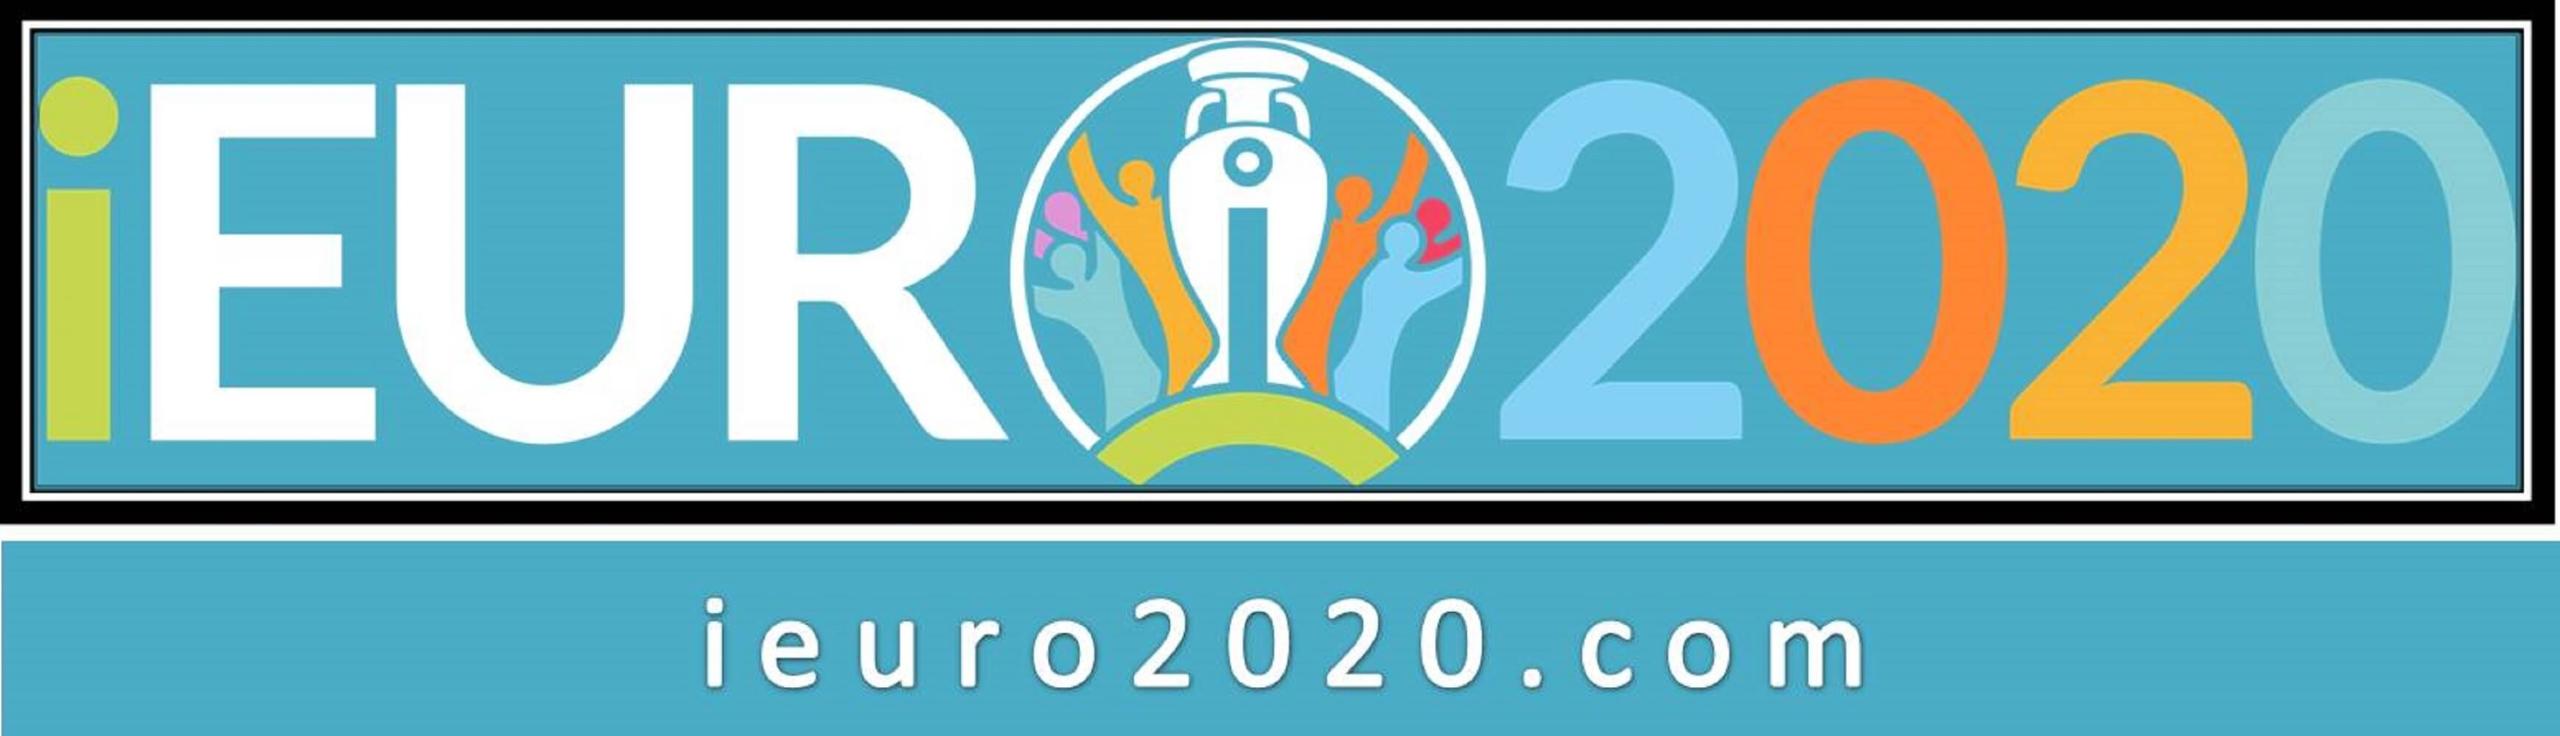 Website Ieuro2020 Vòng chung kết euro 2021 (@ieuro2020) Cover Image